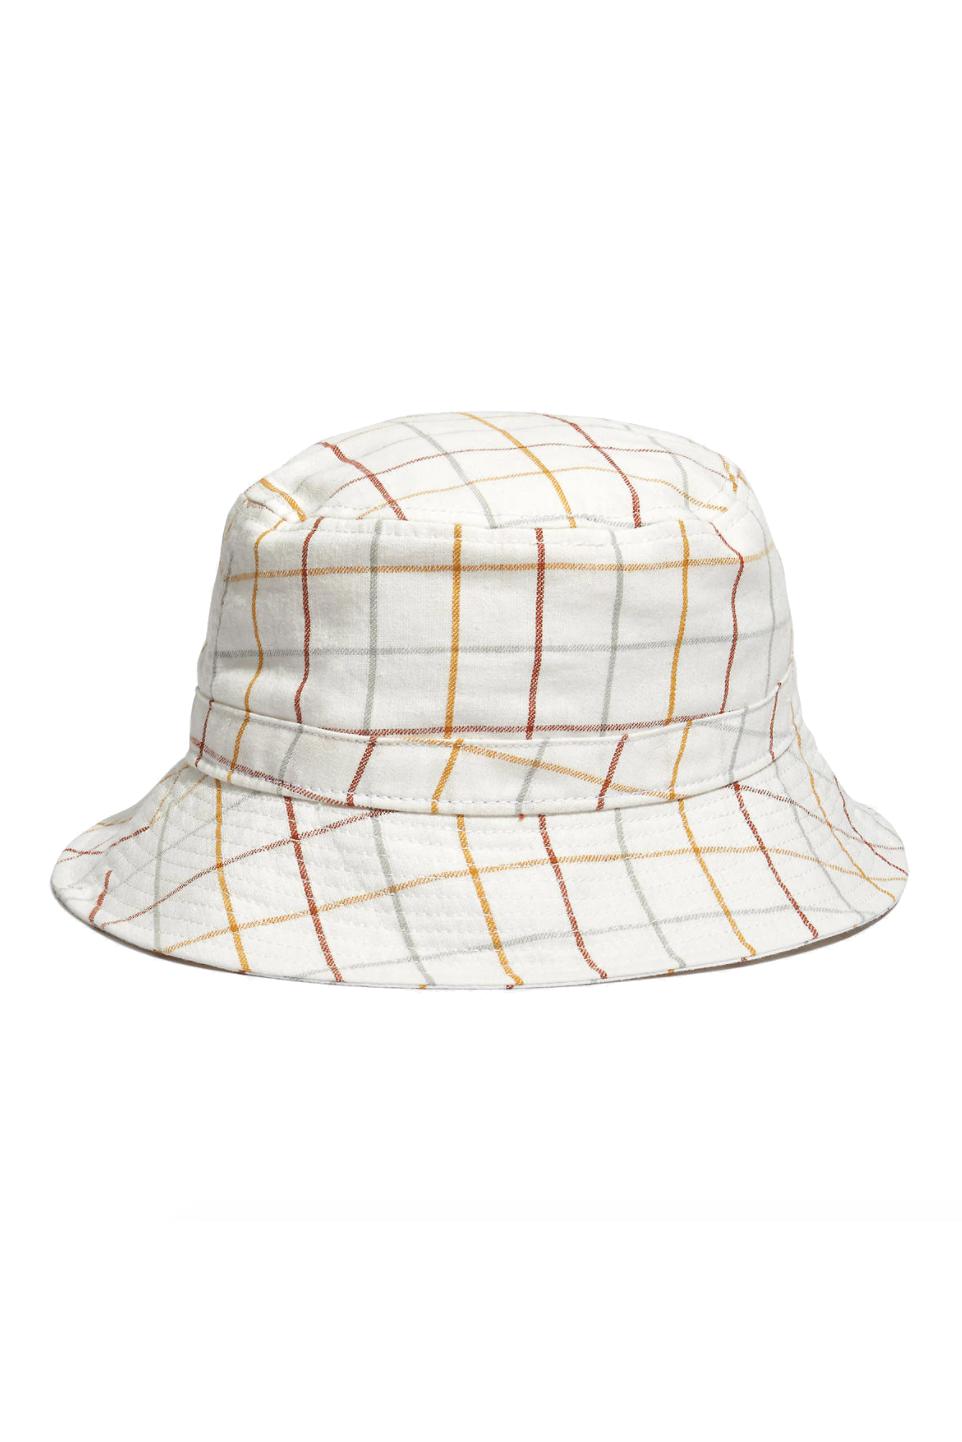 12 Stylish Bucket Hats For 2021 Best Bucket Hats For Women